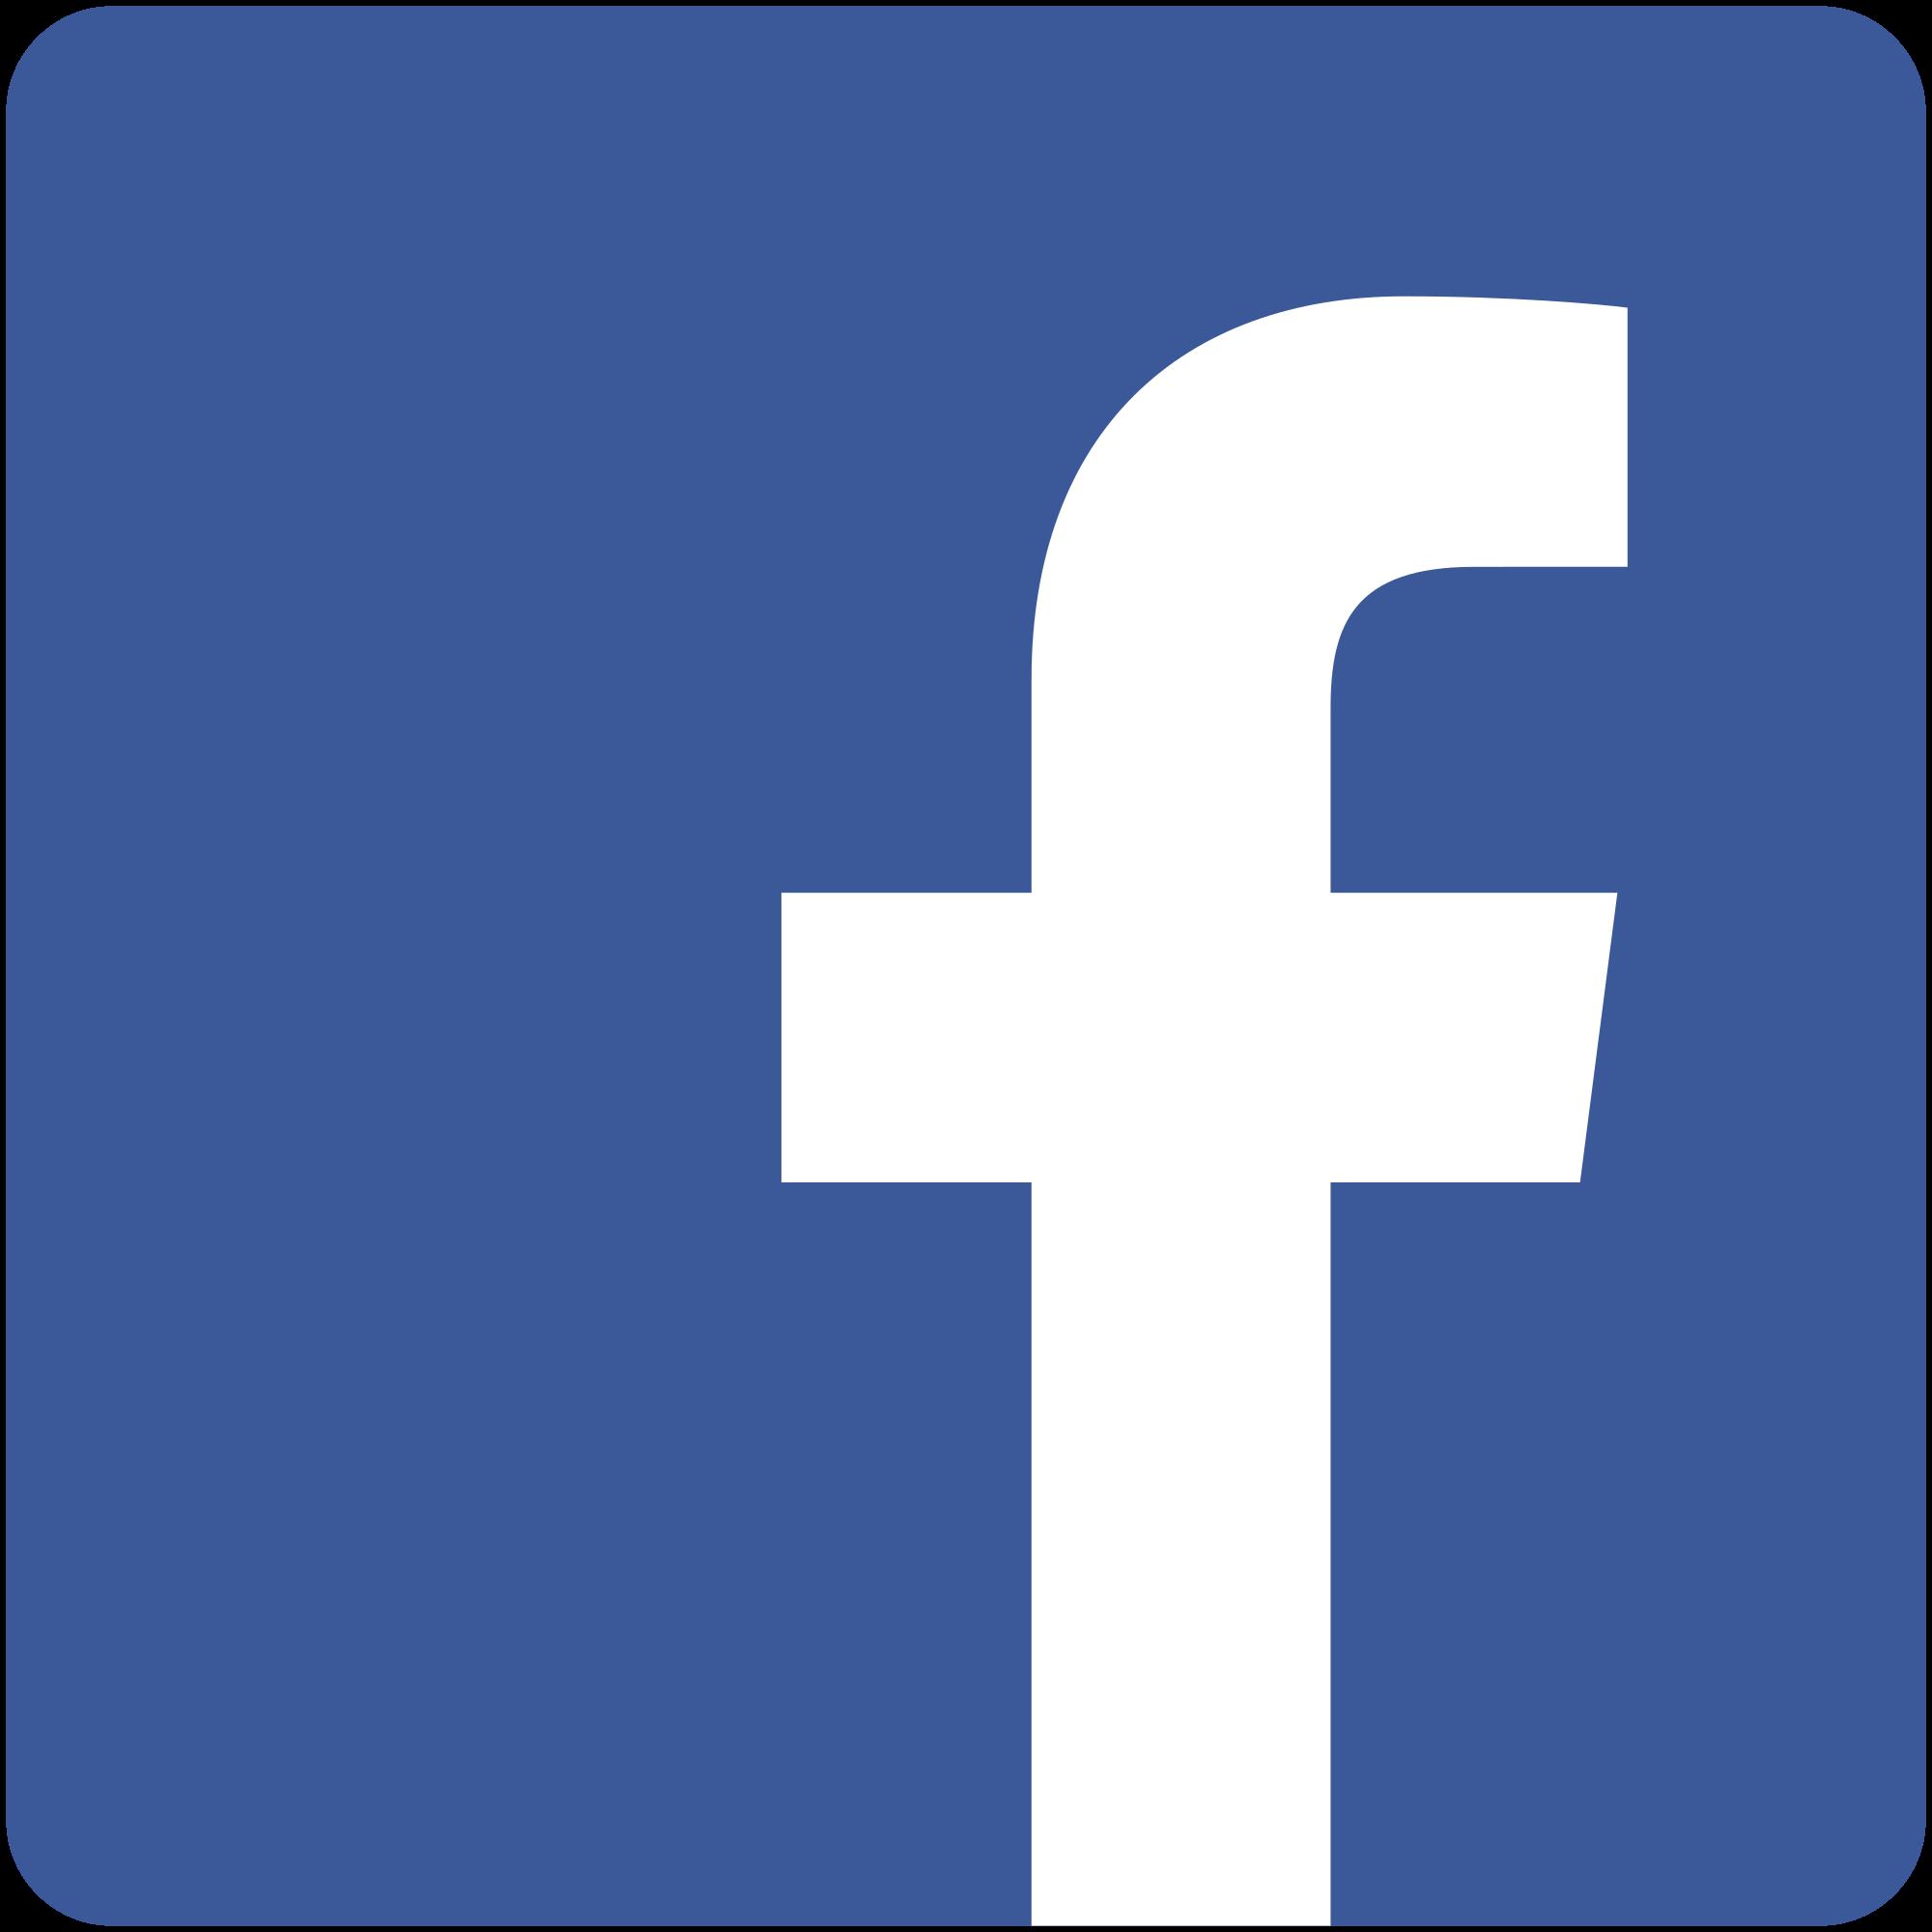 Pagina Facebook - Luca Sbarbati - Il blog